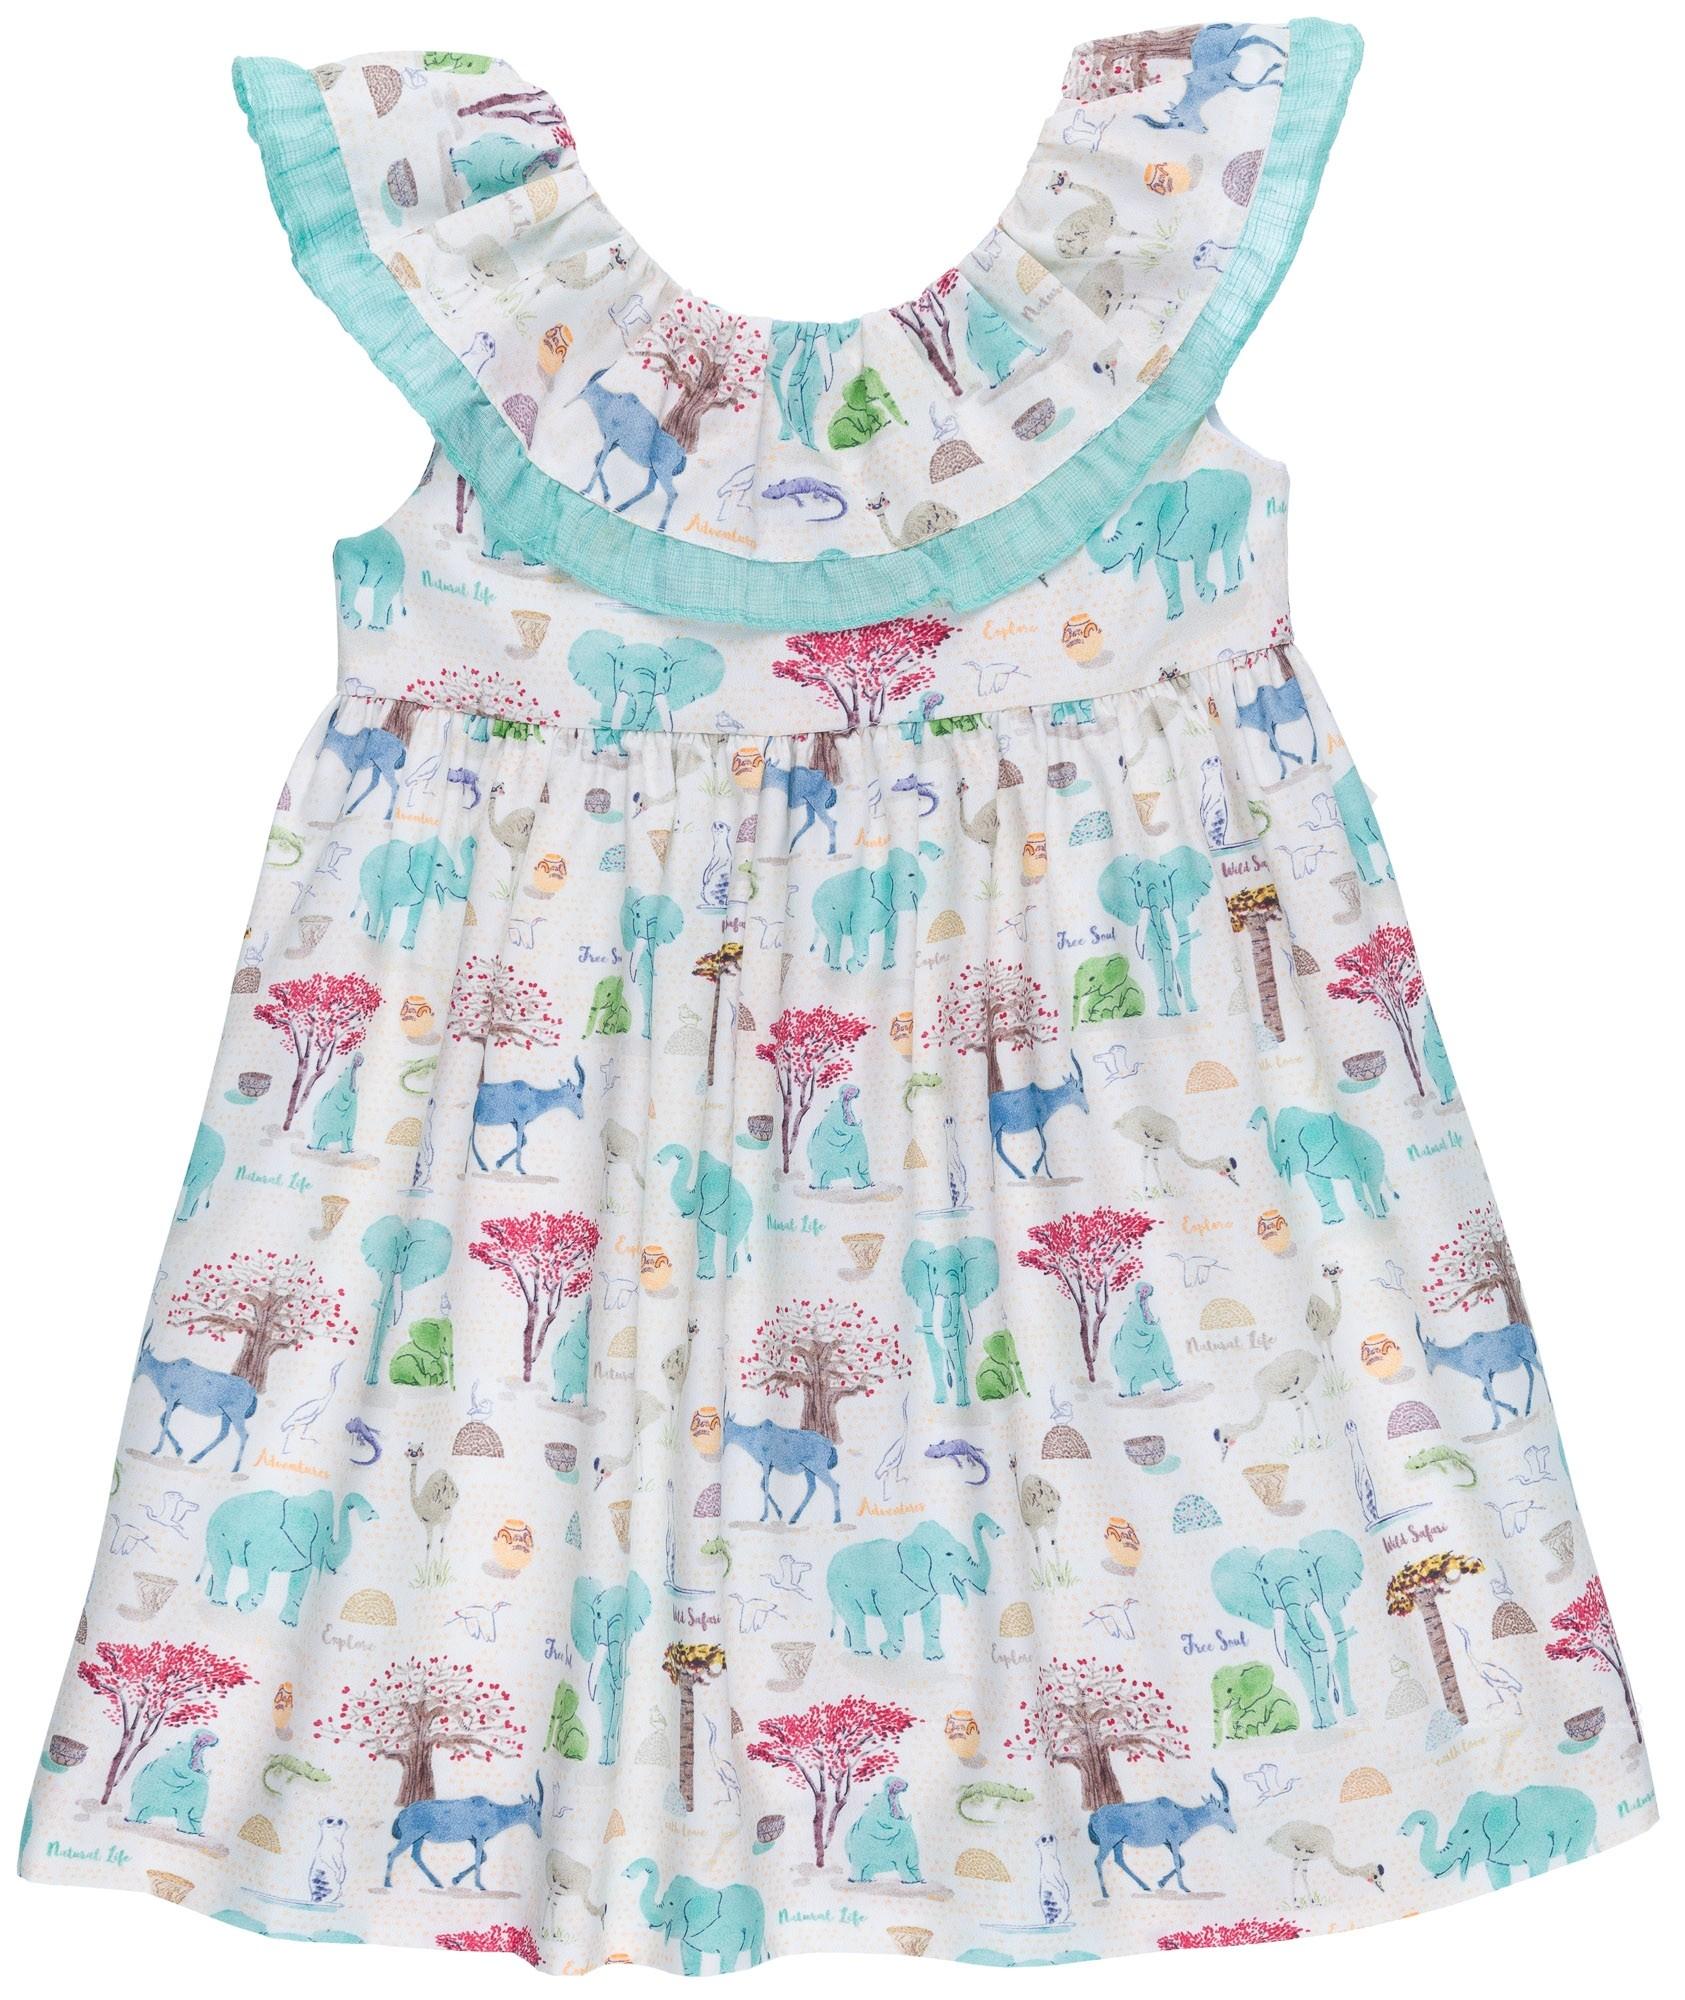 5169ad48d Home; Girls Aqua Green Animal Print Dress with Ruffle Collar. Ancar Vestido  Niña Cuello Volante & Lazada Estampado Animales Verde Agua ...